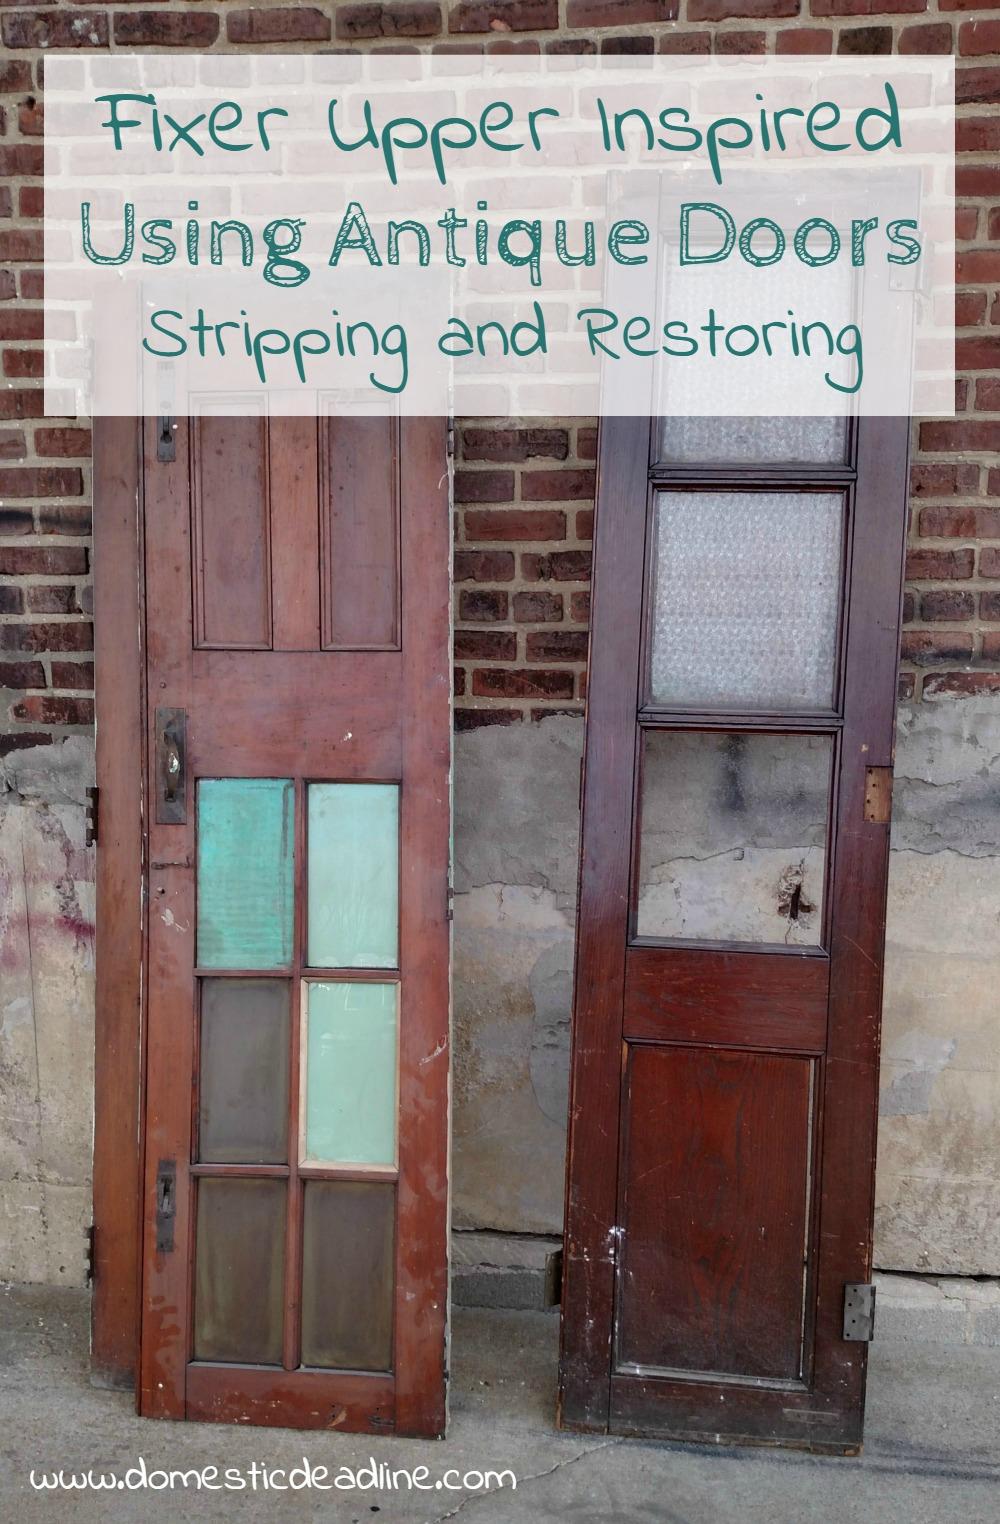 & Stripping and Restoring Antique Doors - Fixer Upper Inspired